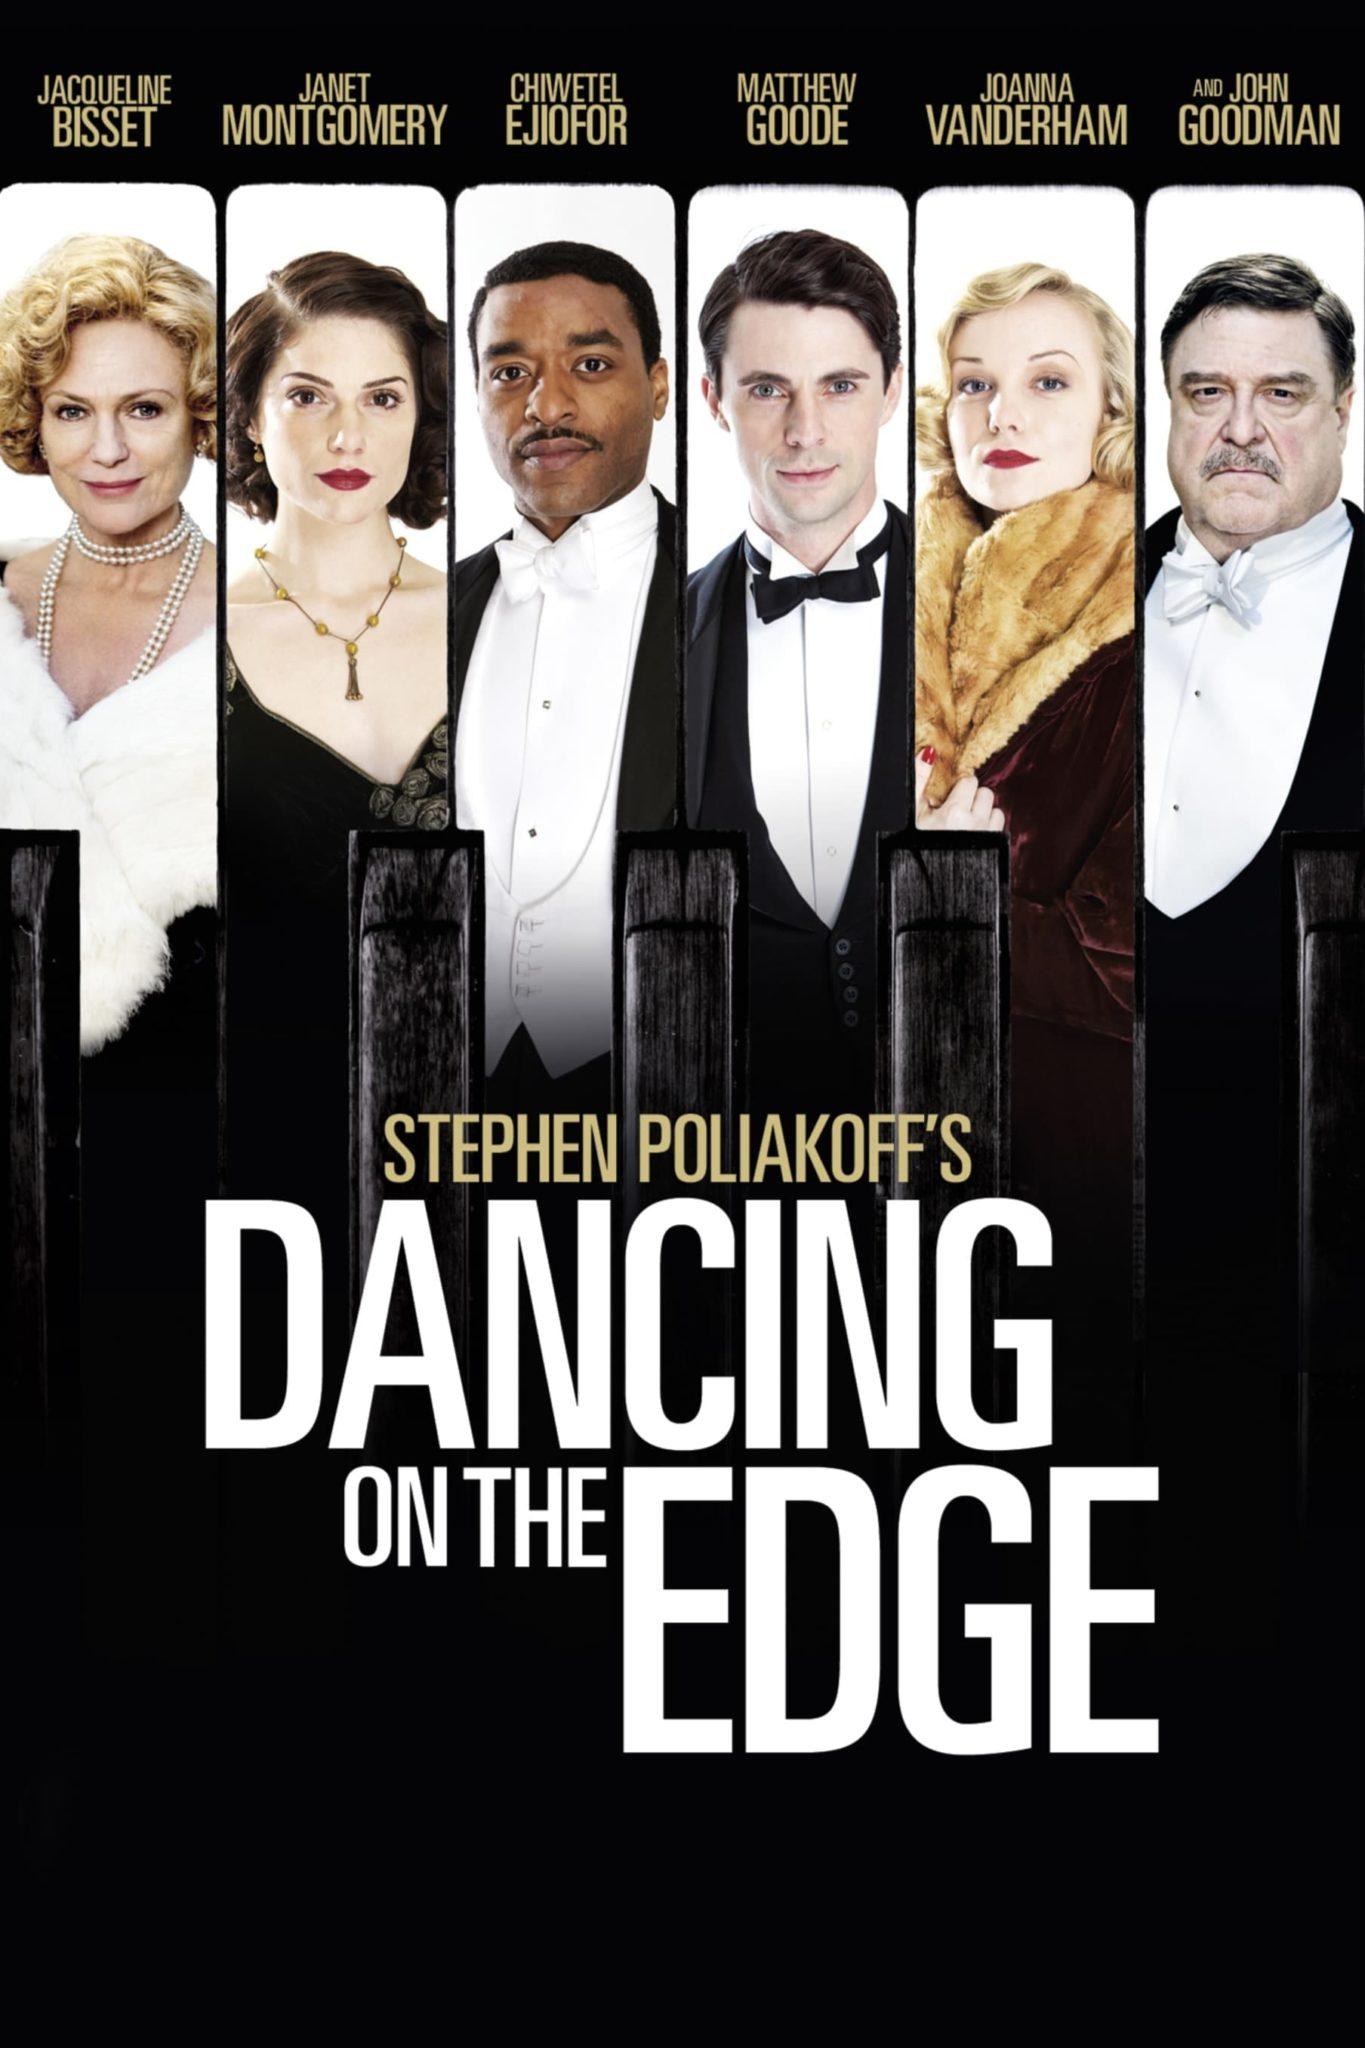 Dancing on the Edge de Stephen Poliakoff affiche film cinéma